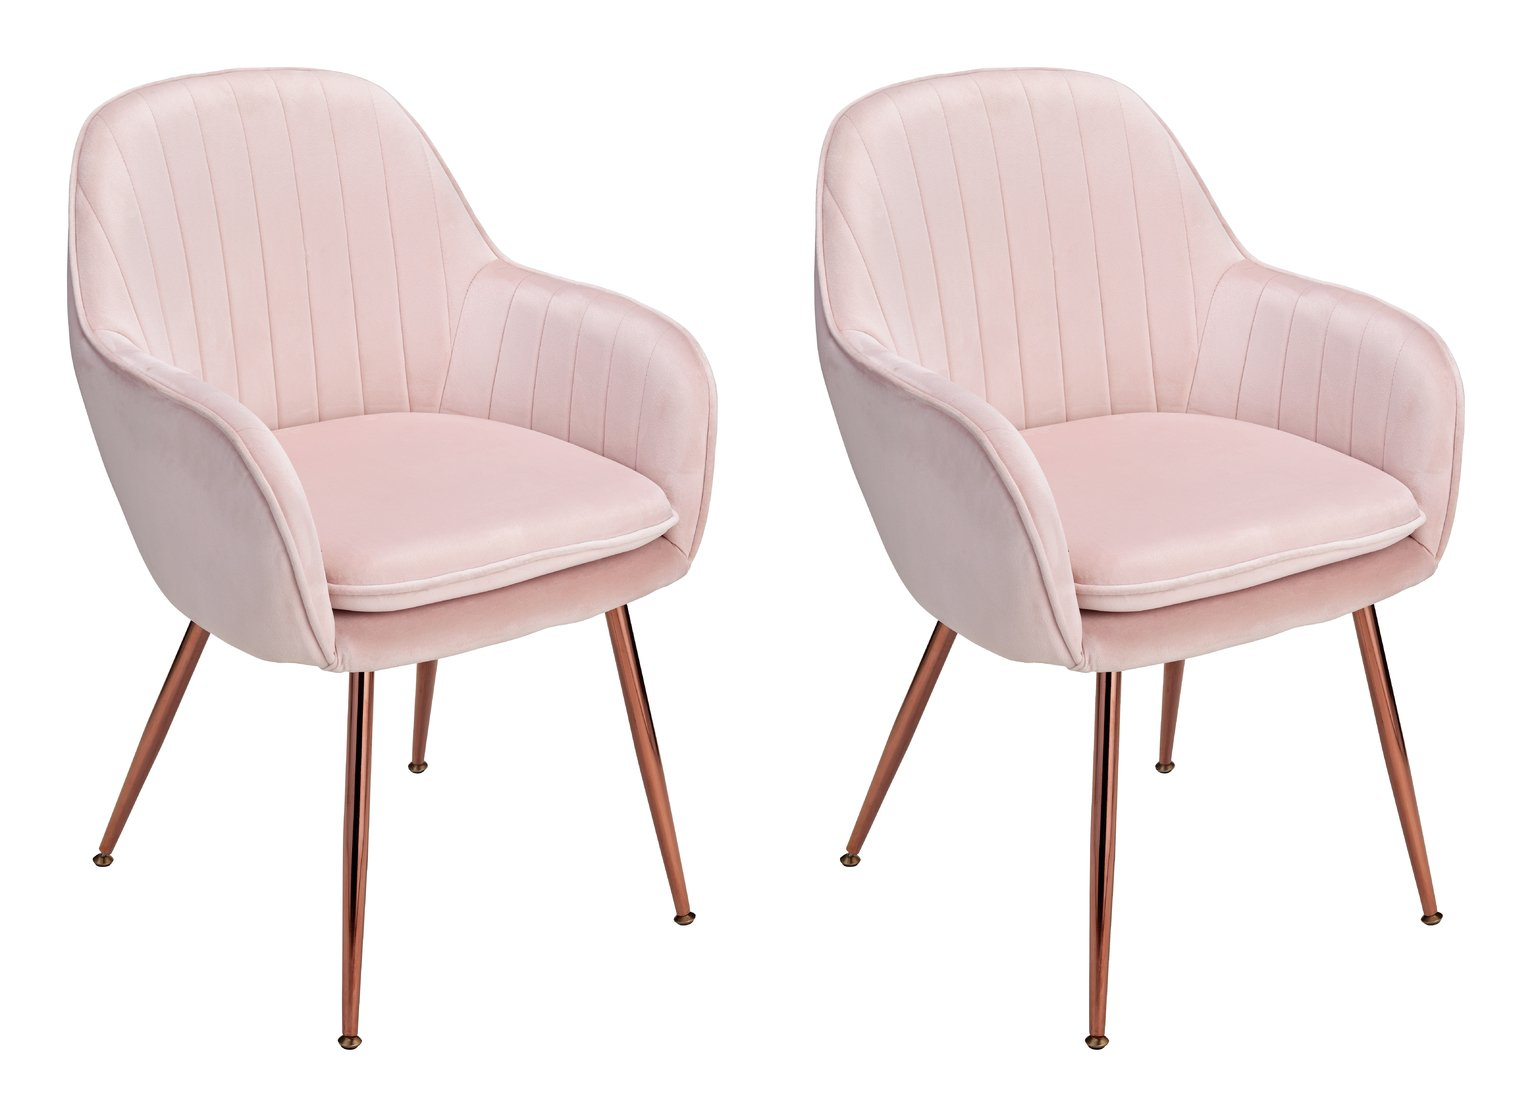 Argos Home Bella Pair of Velvet Dining Chairs - Blush